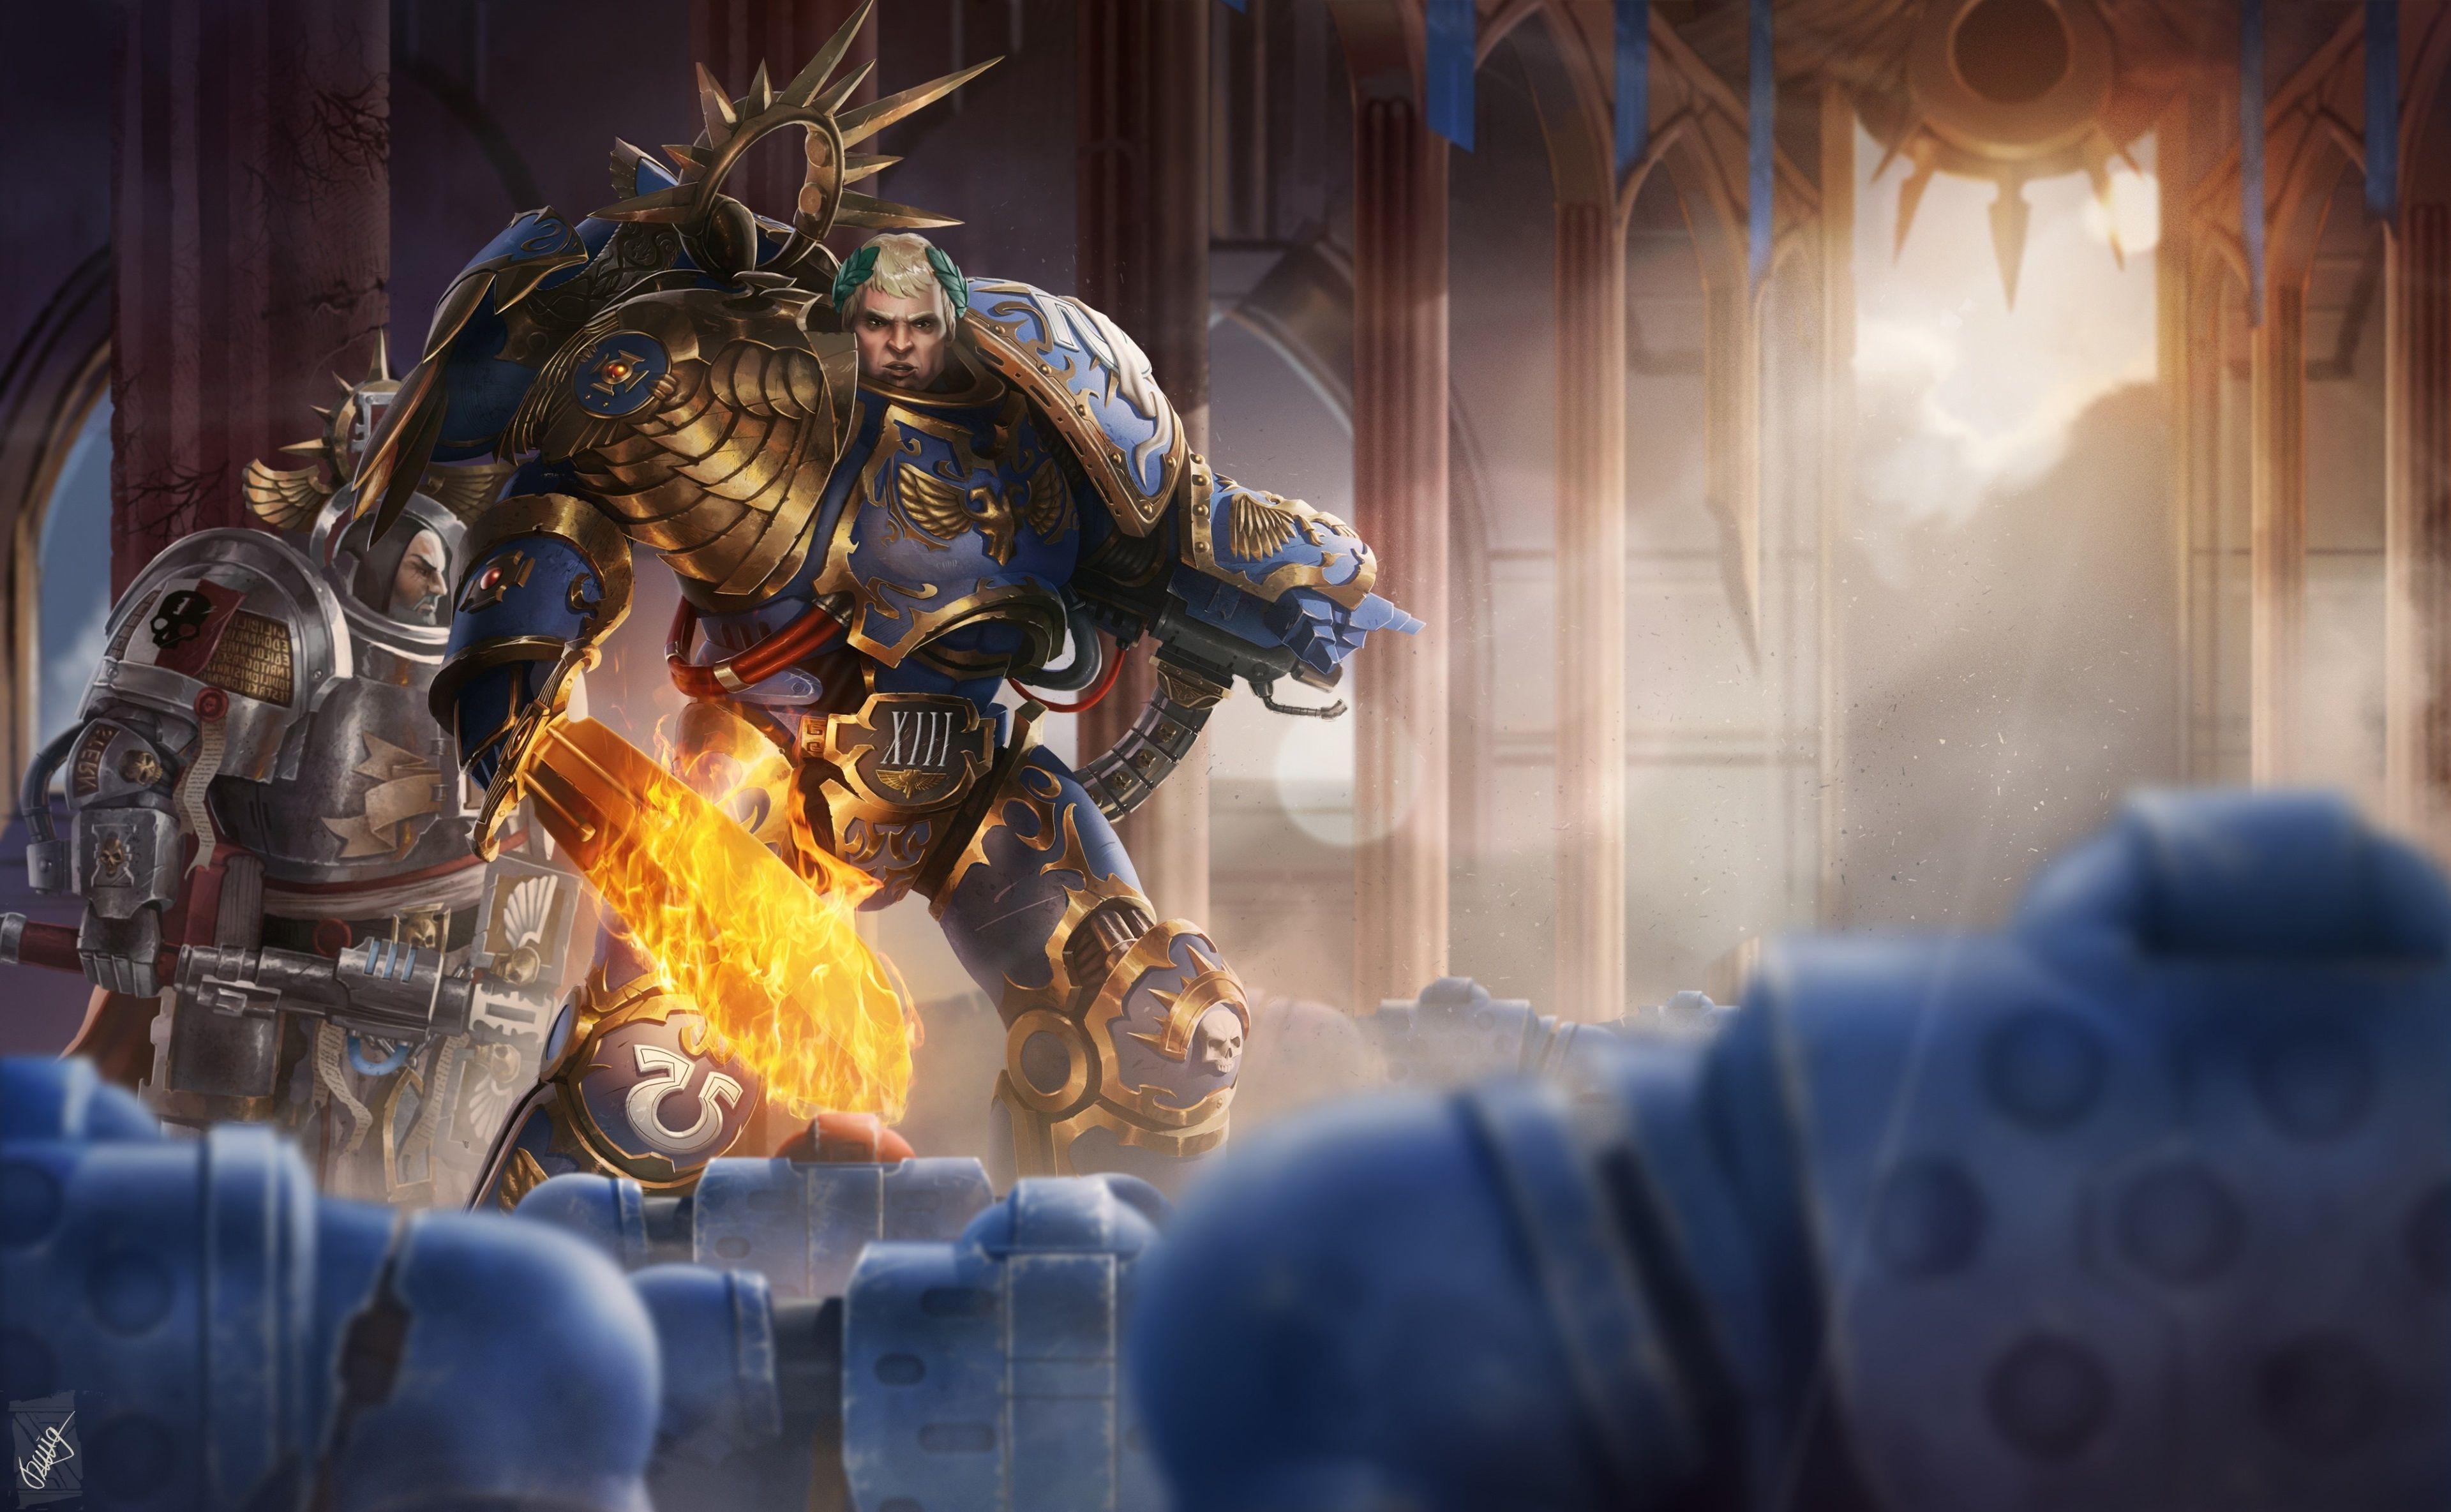 3840x2369 Warhammer 40000 Dawn Of War Iii 4k High Definition Wallpaper Warhammer Warhammer 40k Warhammer 40k Artwork